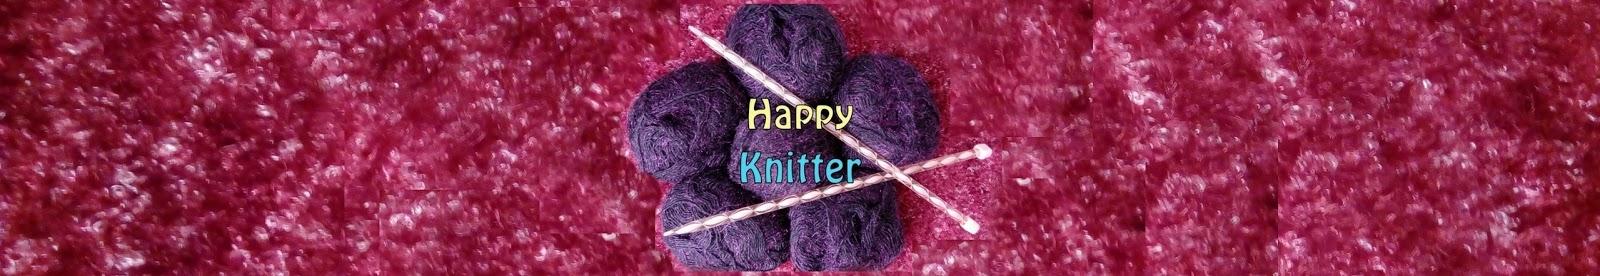 Happy knitter logo